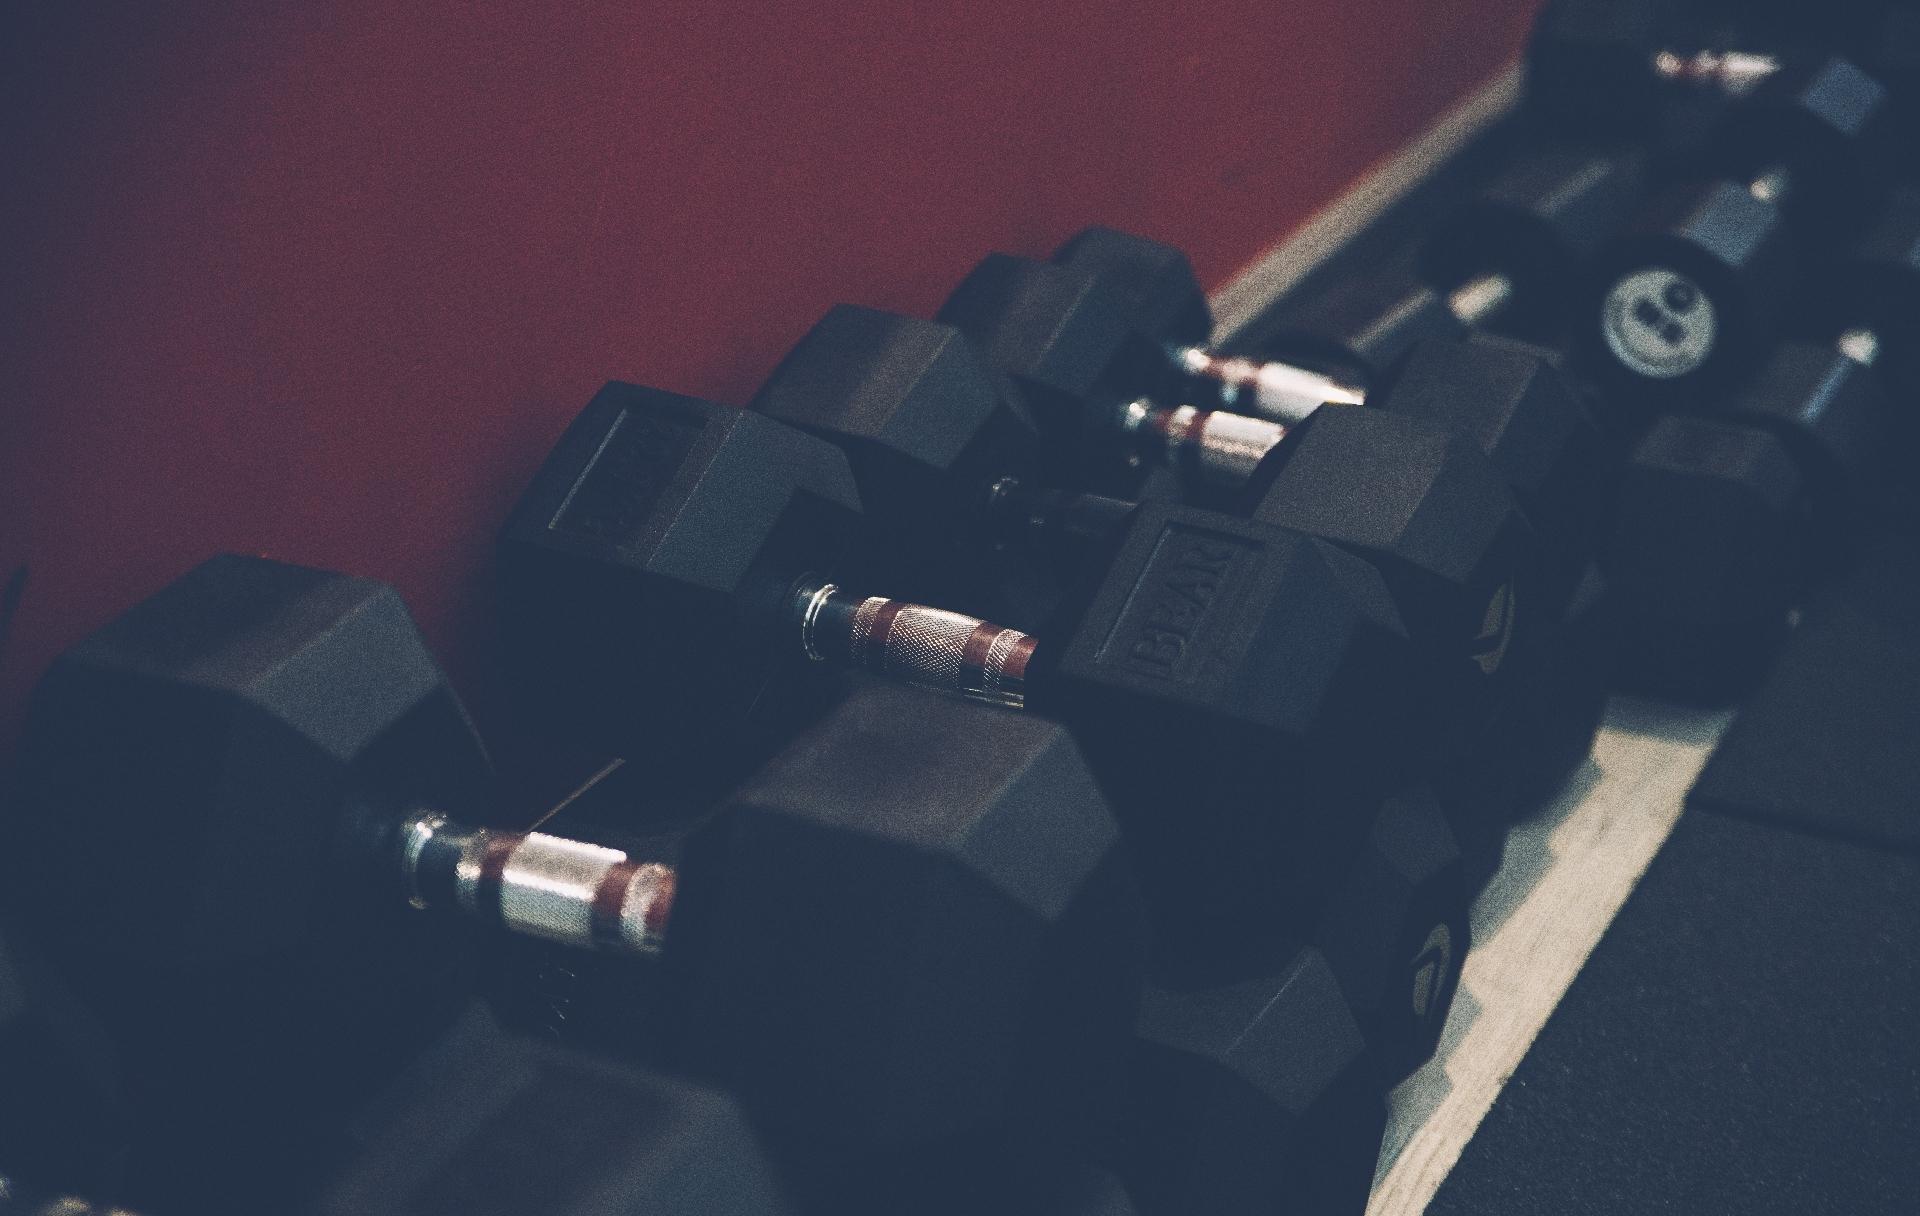 pump alma sport lecce palestra crossfit gag addominali gambe glutei